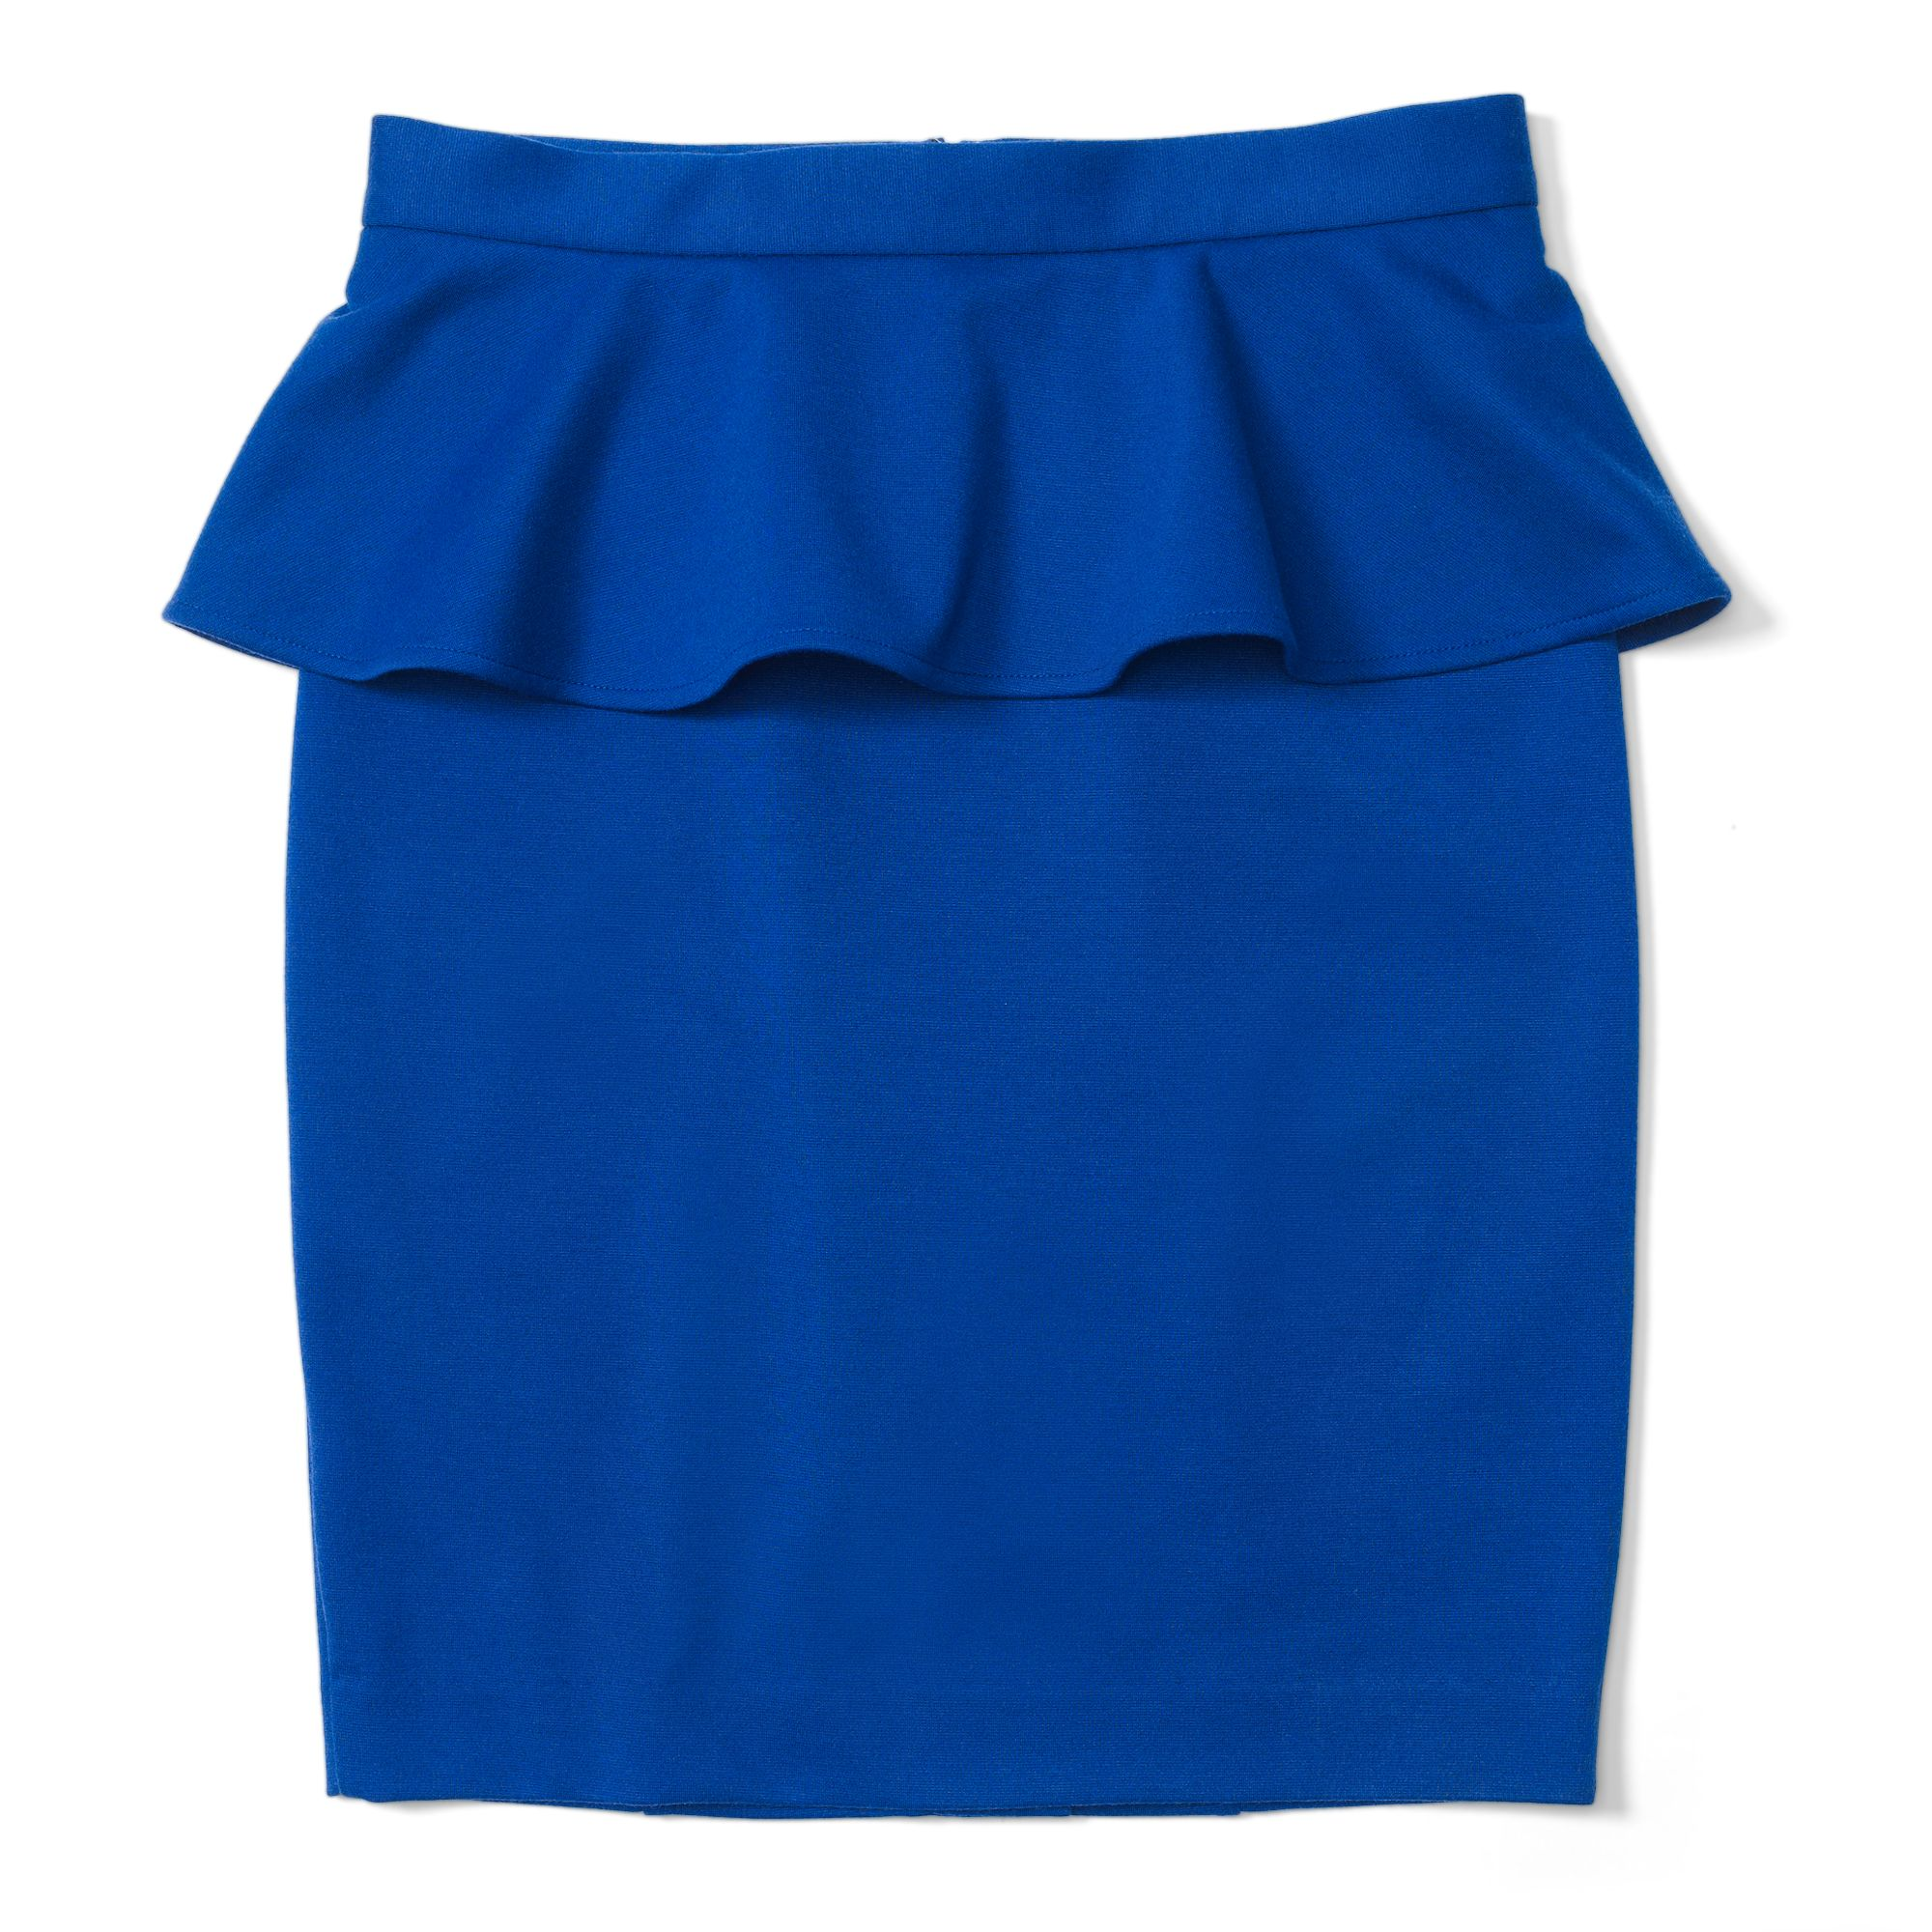 club monaco kate peplum skirt in blue blue lyst